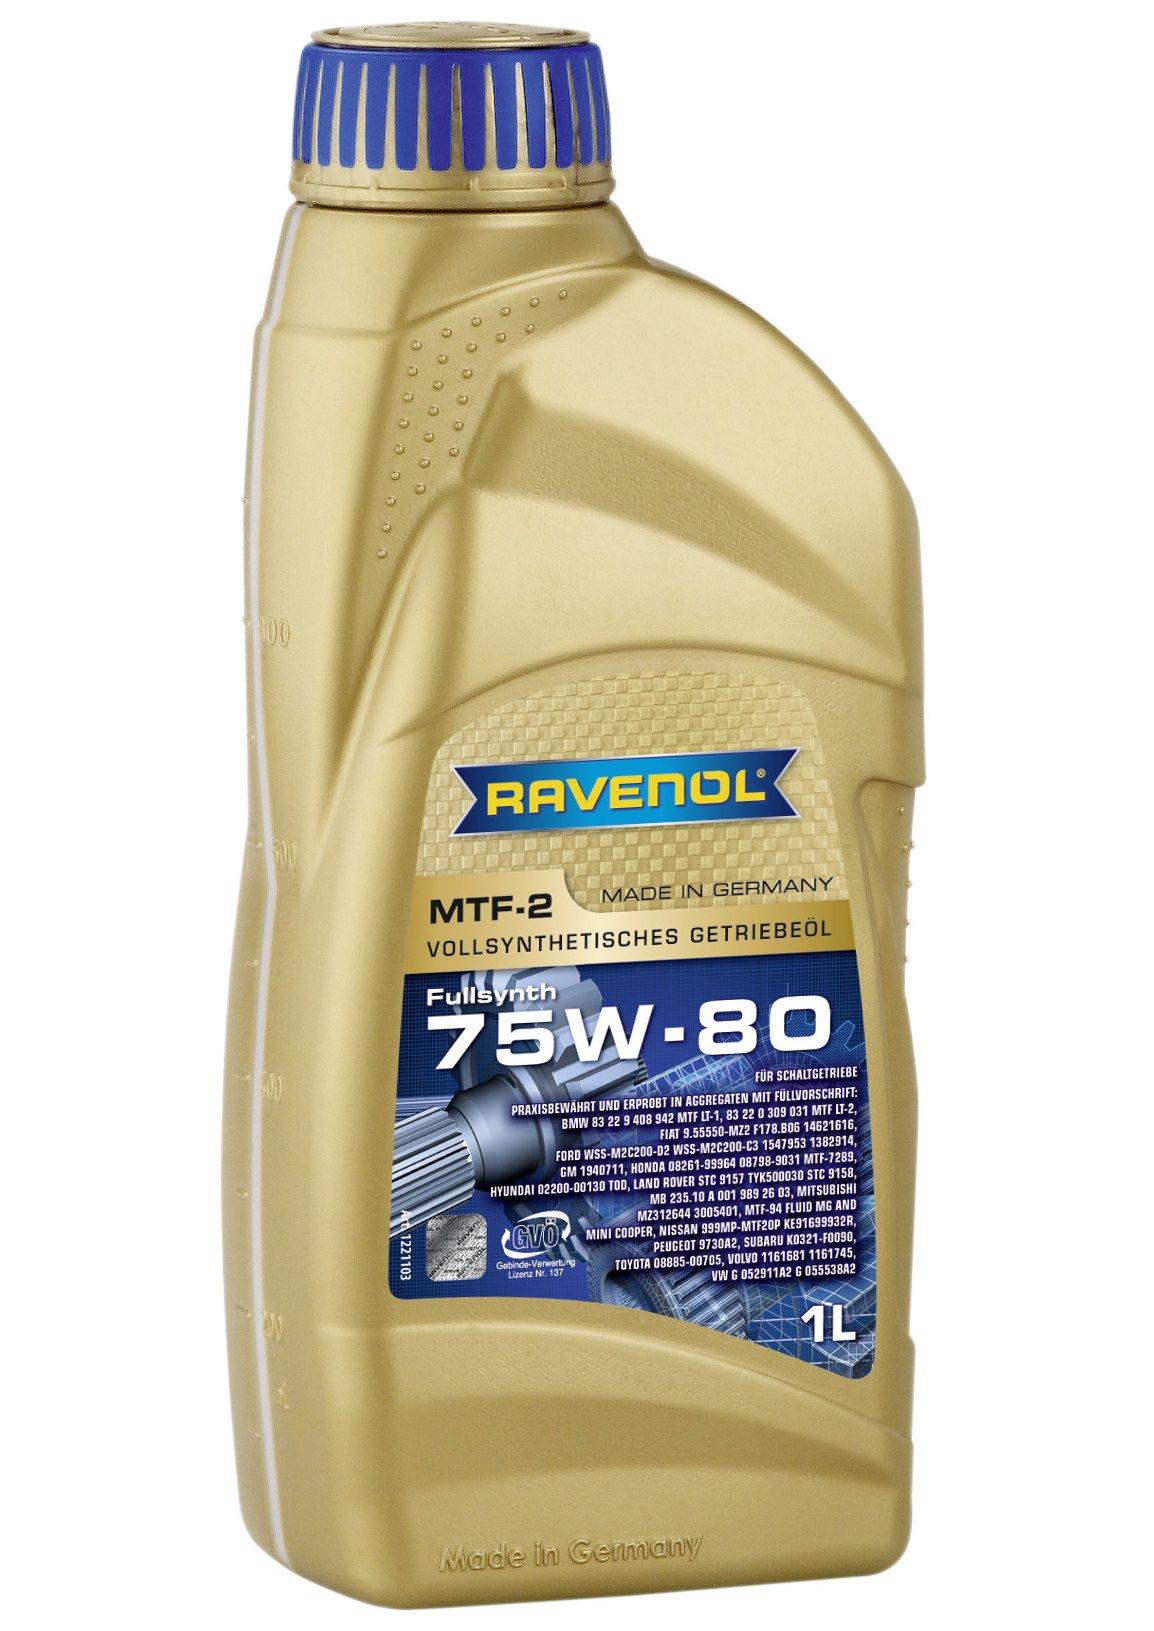 Ravenol J1C1002 SAE 75W-80 Manual Transmission Fluid - MTF-2 Full Synthetic API GL-4 (1 Liter)